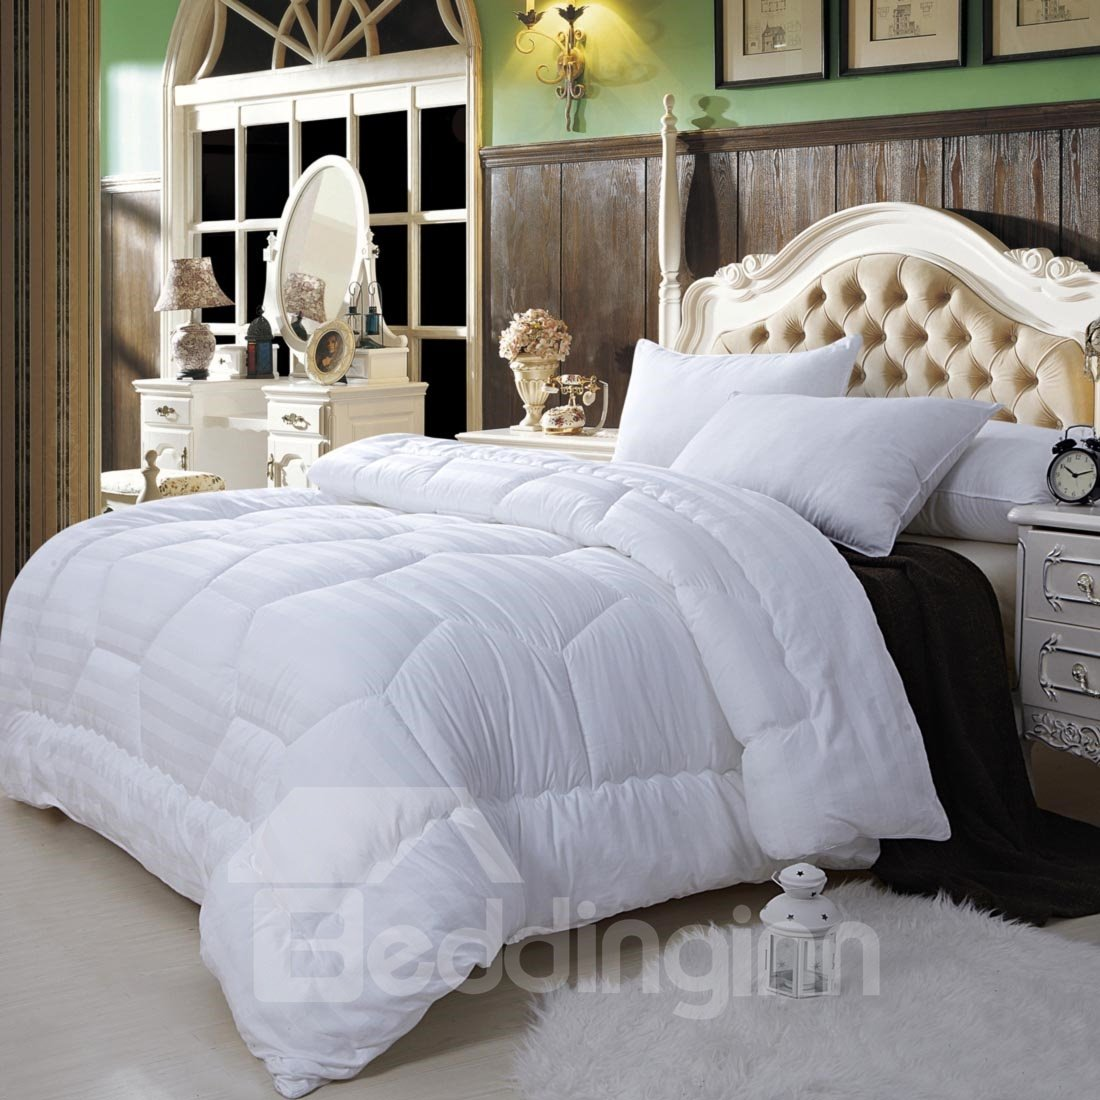 Super Soft White Twin 100% Cotton Down Filled Comforter W59 x L78